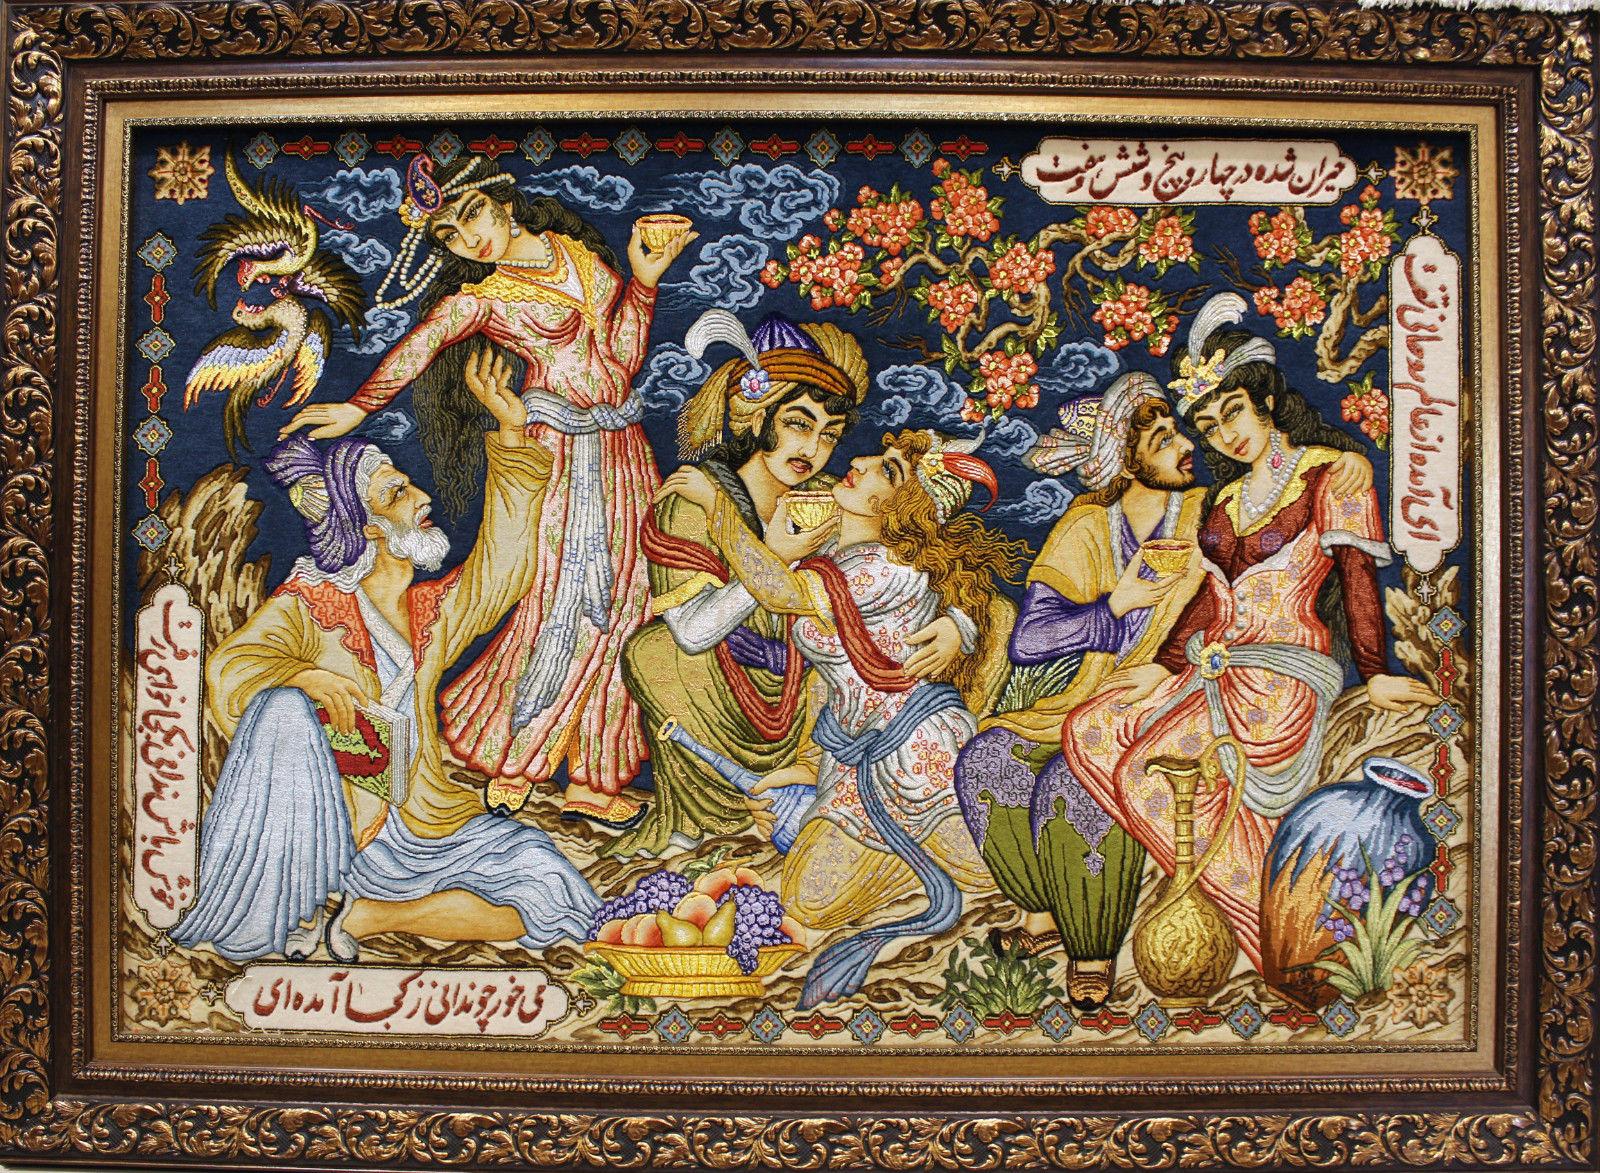 4'11″W x 3'4″H Handmade Wool and Silk FARSH KHAYYAM POEM Persian Framed Tableau Rug Tapestry Wall Hanging 12980805